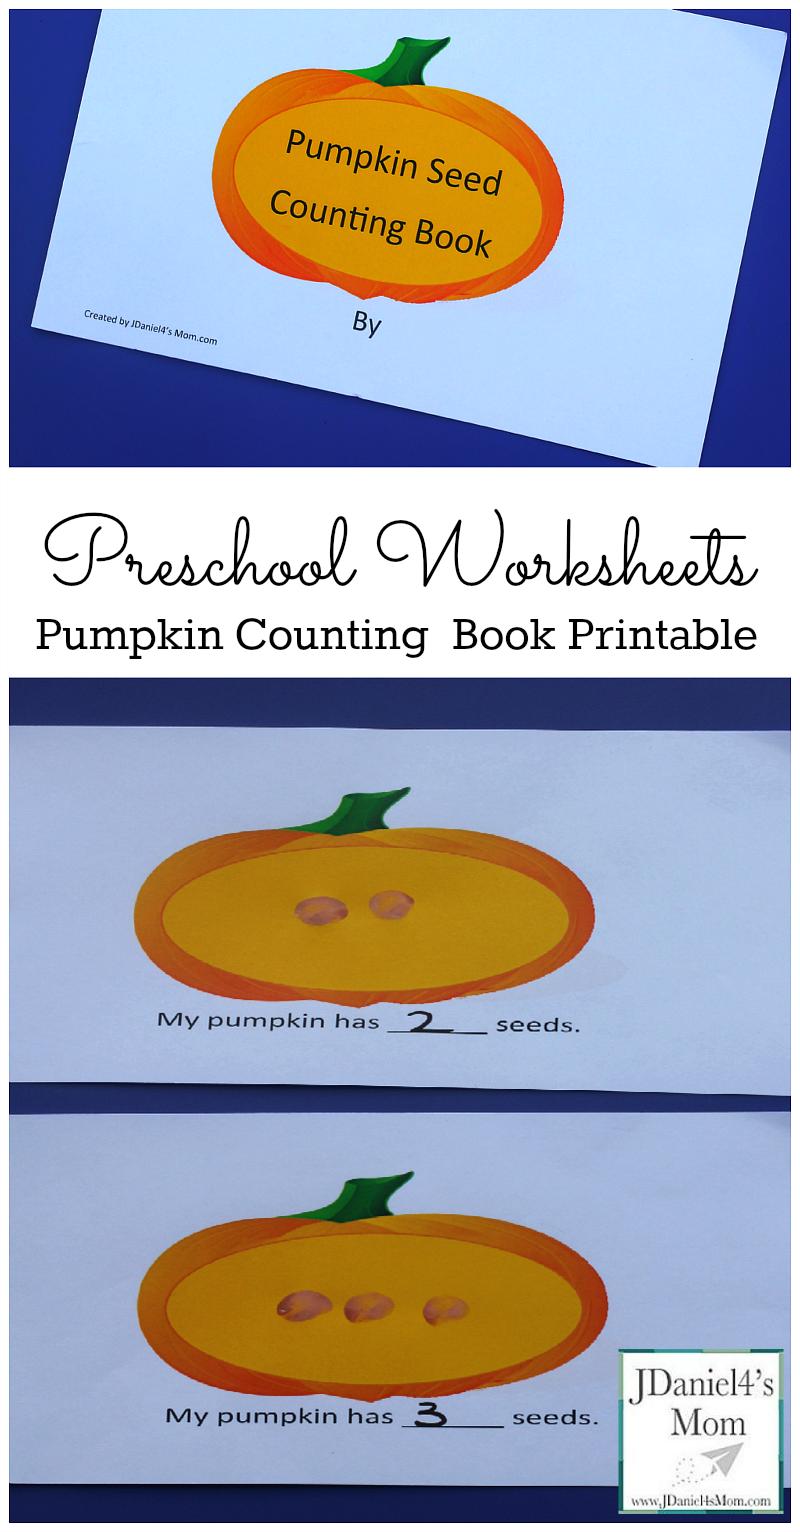 pumpkin counting preschool worksheets pumpkin best free printable worksheets. Black Bedroom Furniture Sets. Home Design Ideas